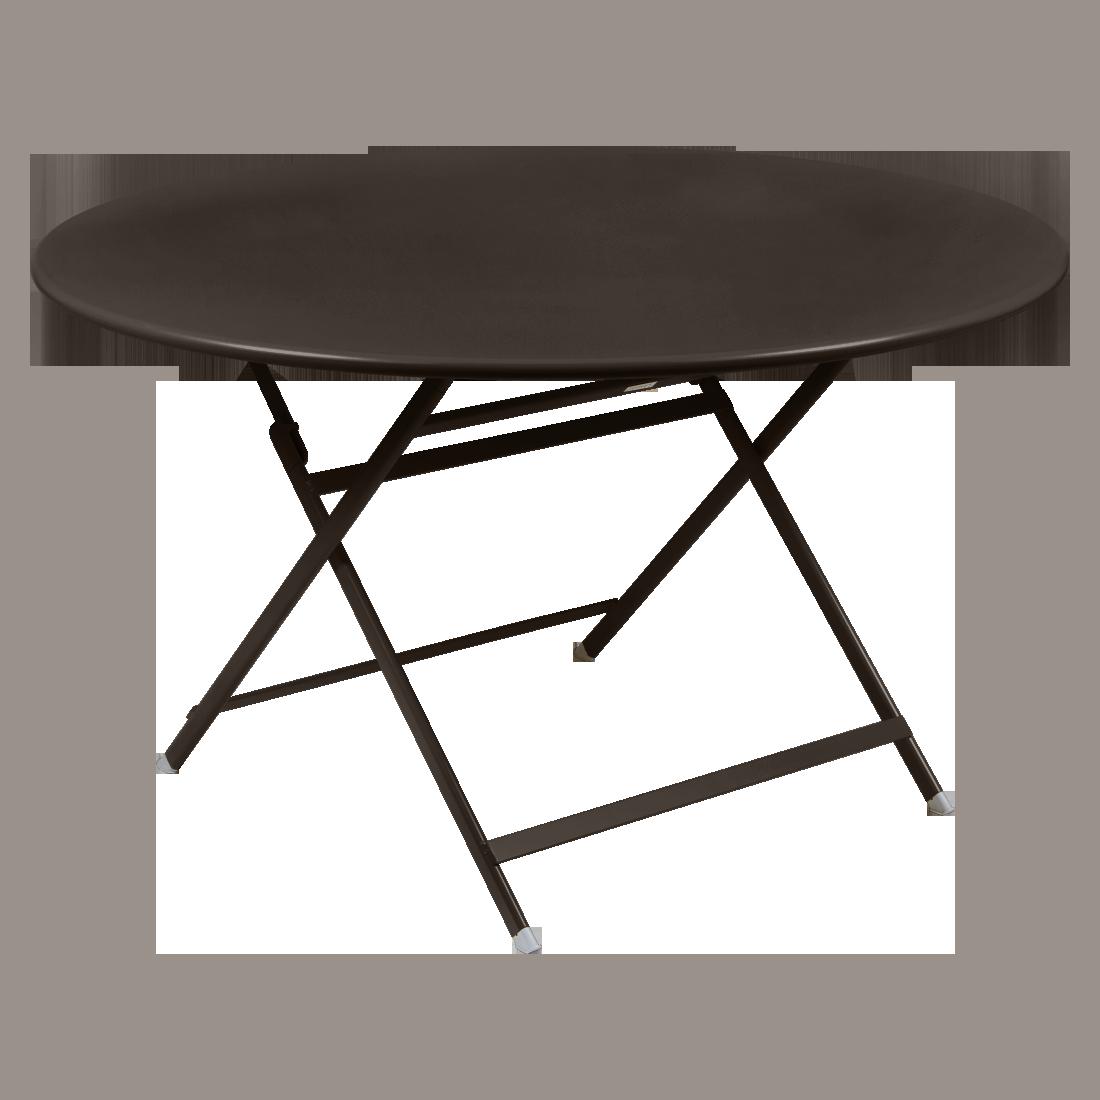 table de jardin pliante, table metal ronde, table metal 7 personnes, table de jardin marron, table metal marron